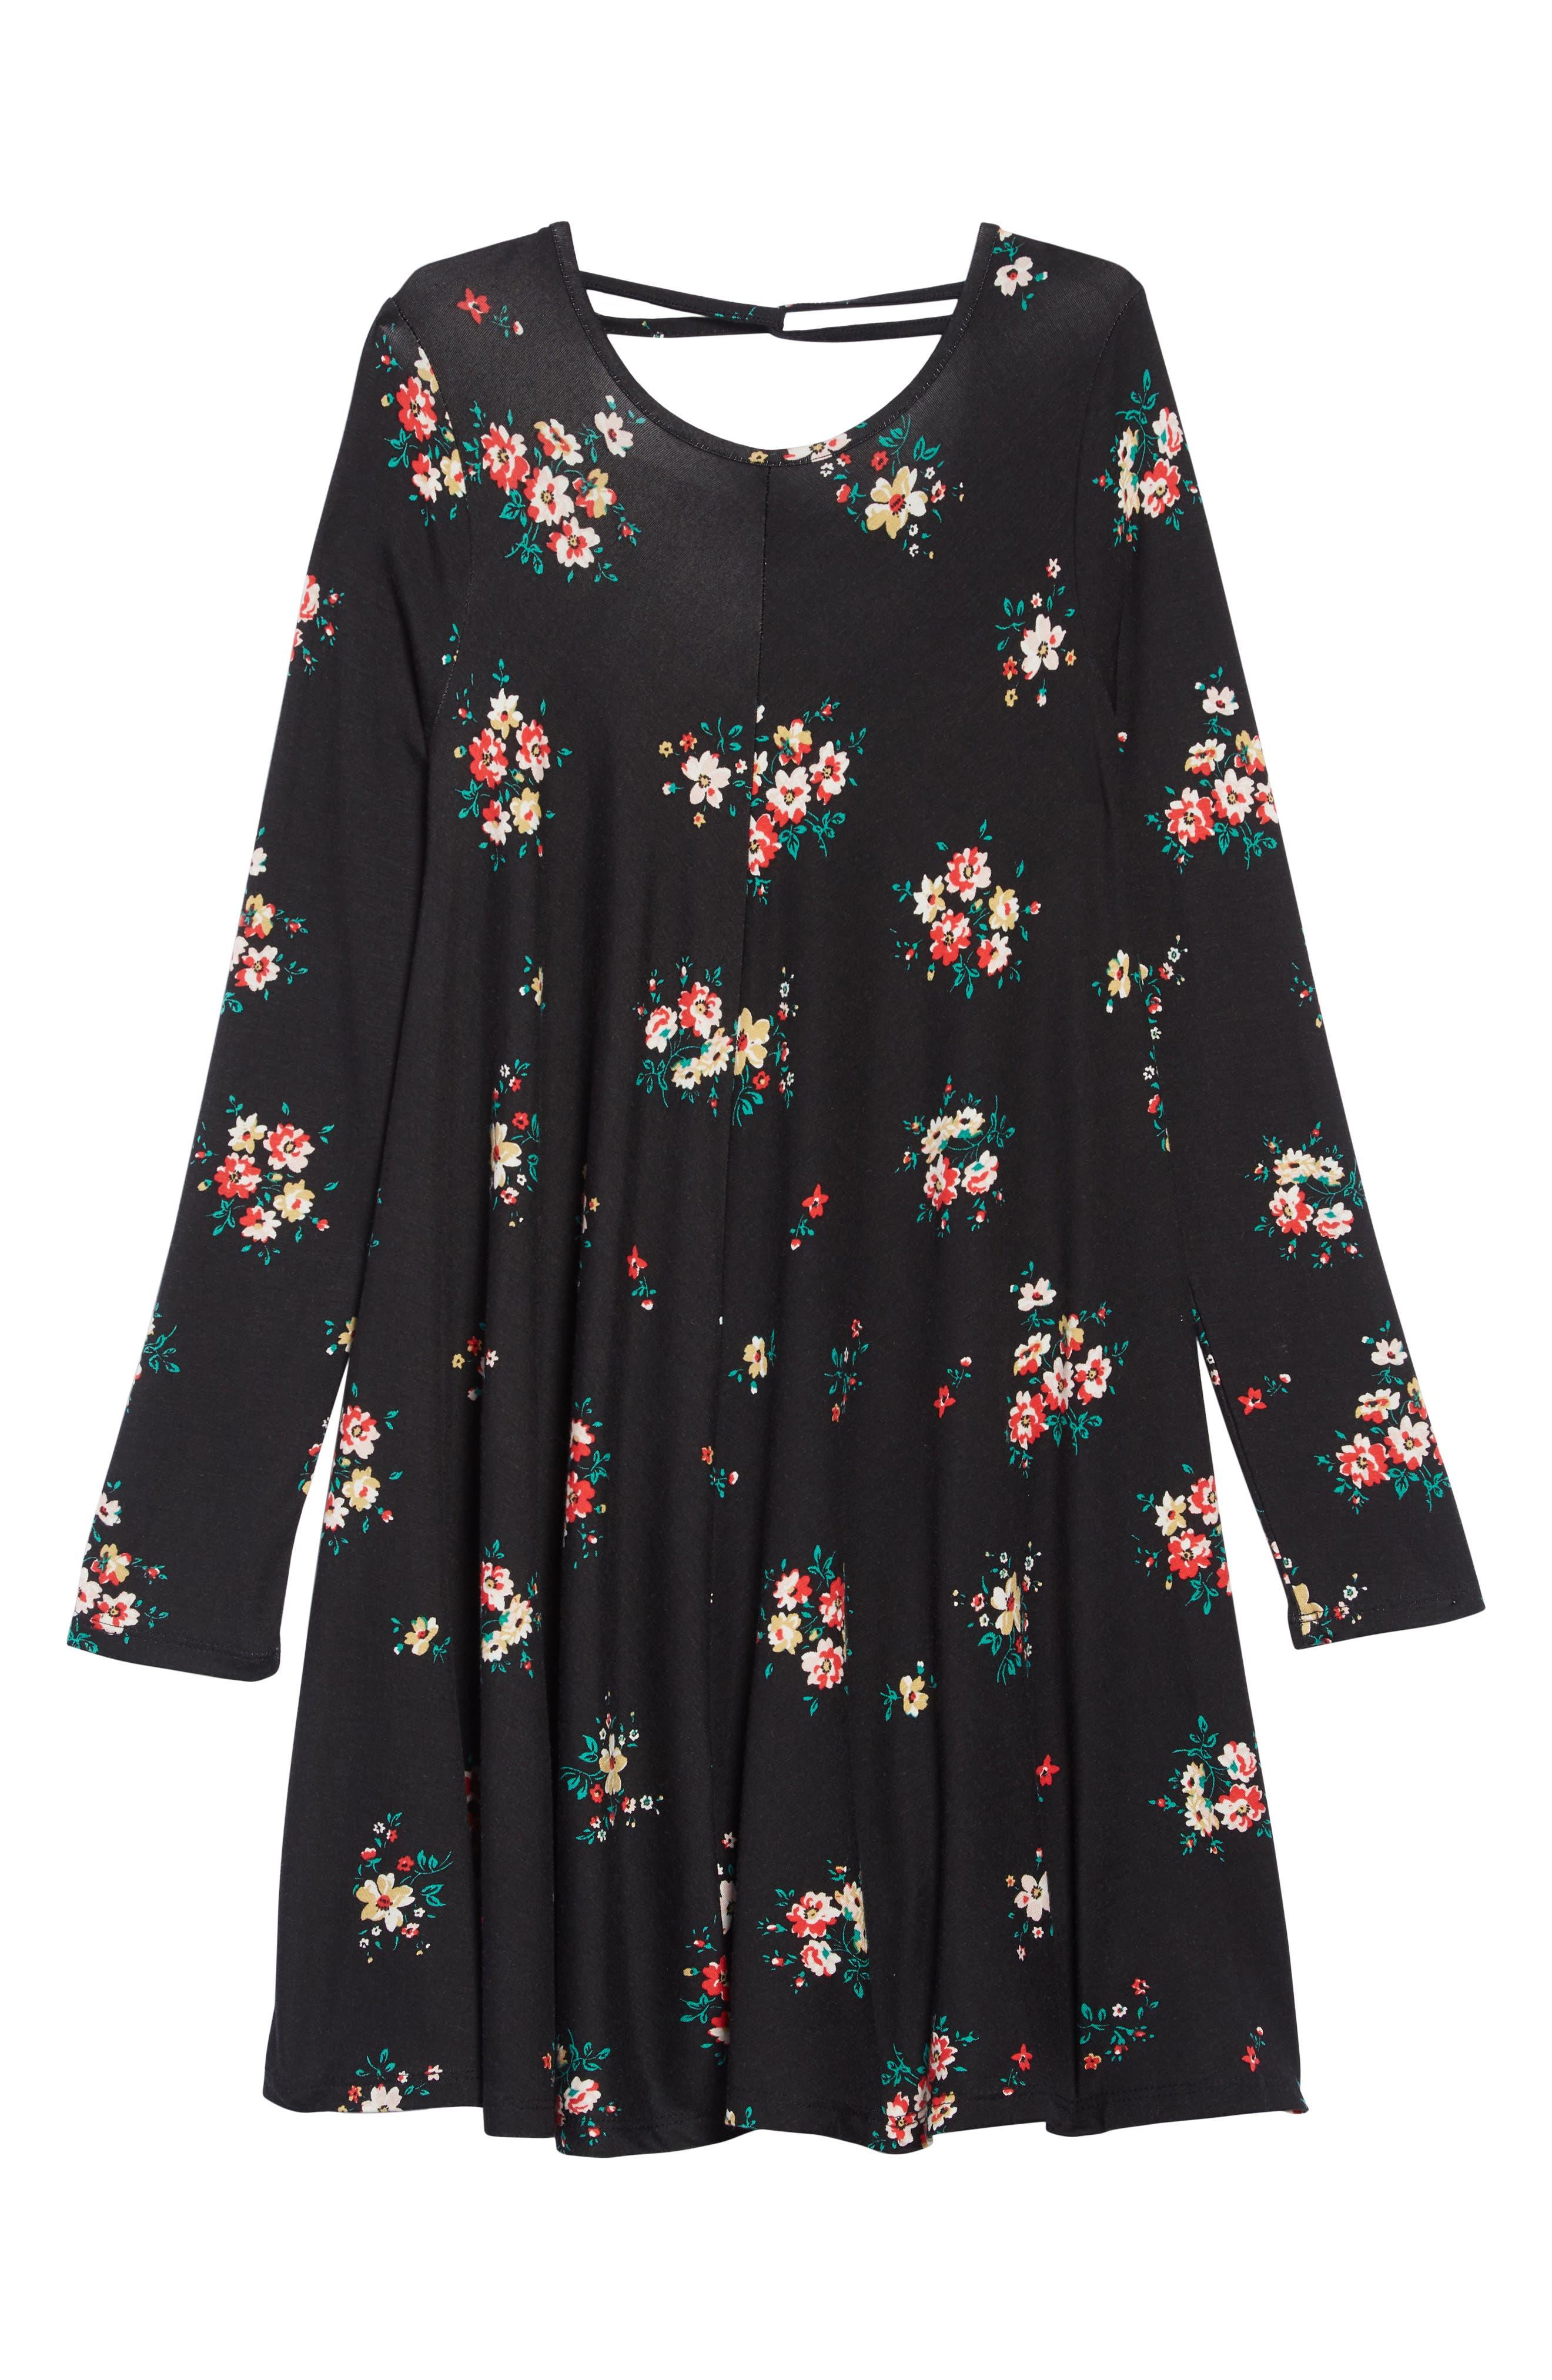 Printed Crisscross Back Shift Dress, Main, color, BLACK PRETTY FLORAL